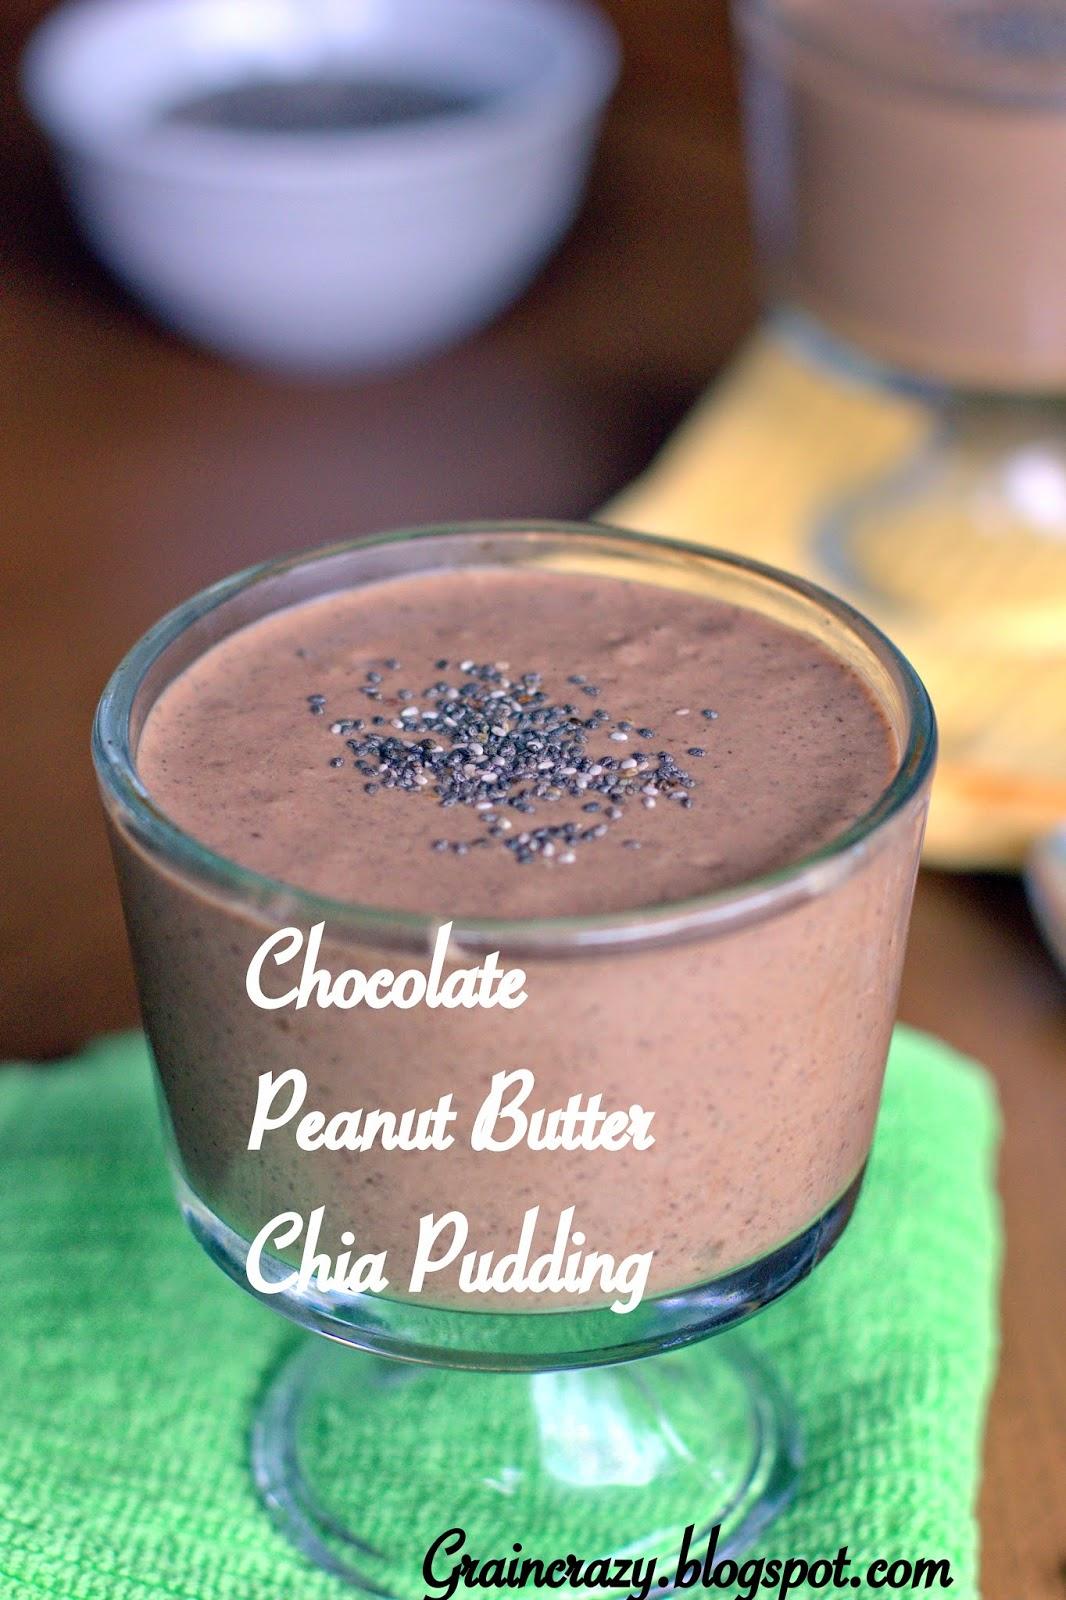 Grain Crazy: Chocolate Peanut Butter Chia Pudding